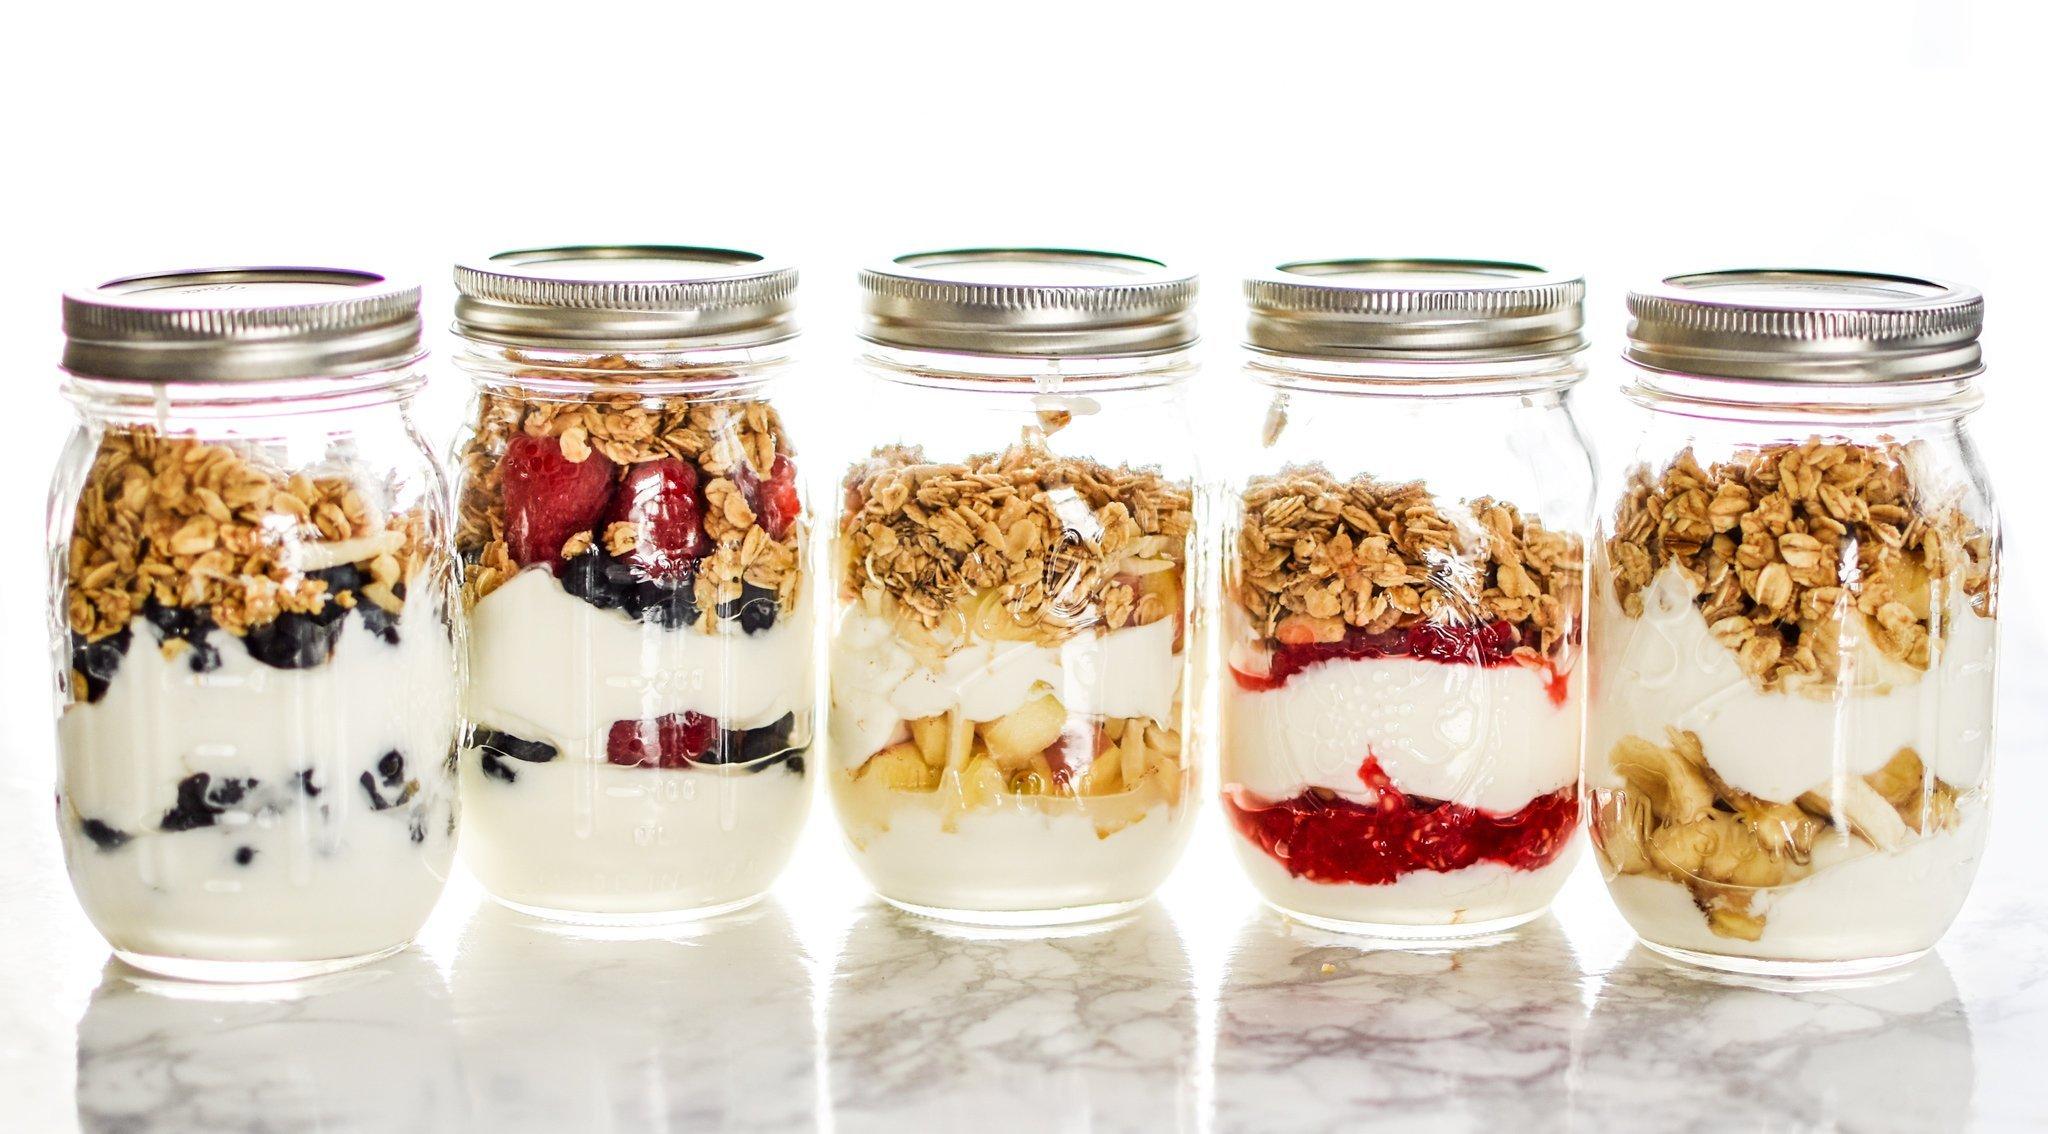 Fruit and greek yogurt parfaits in mason jars.